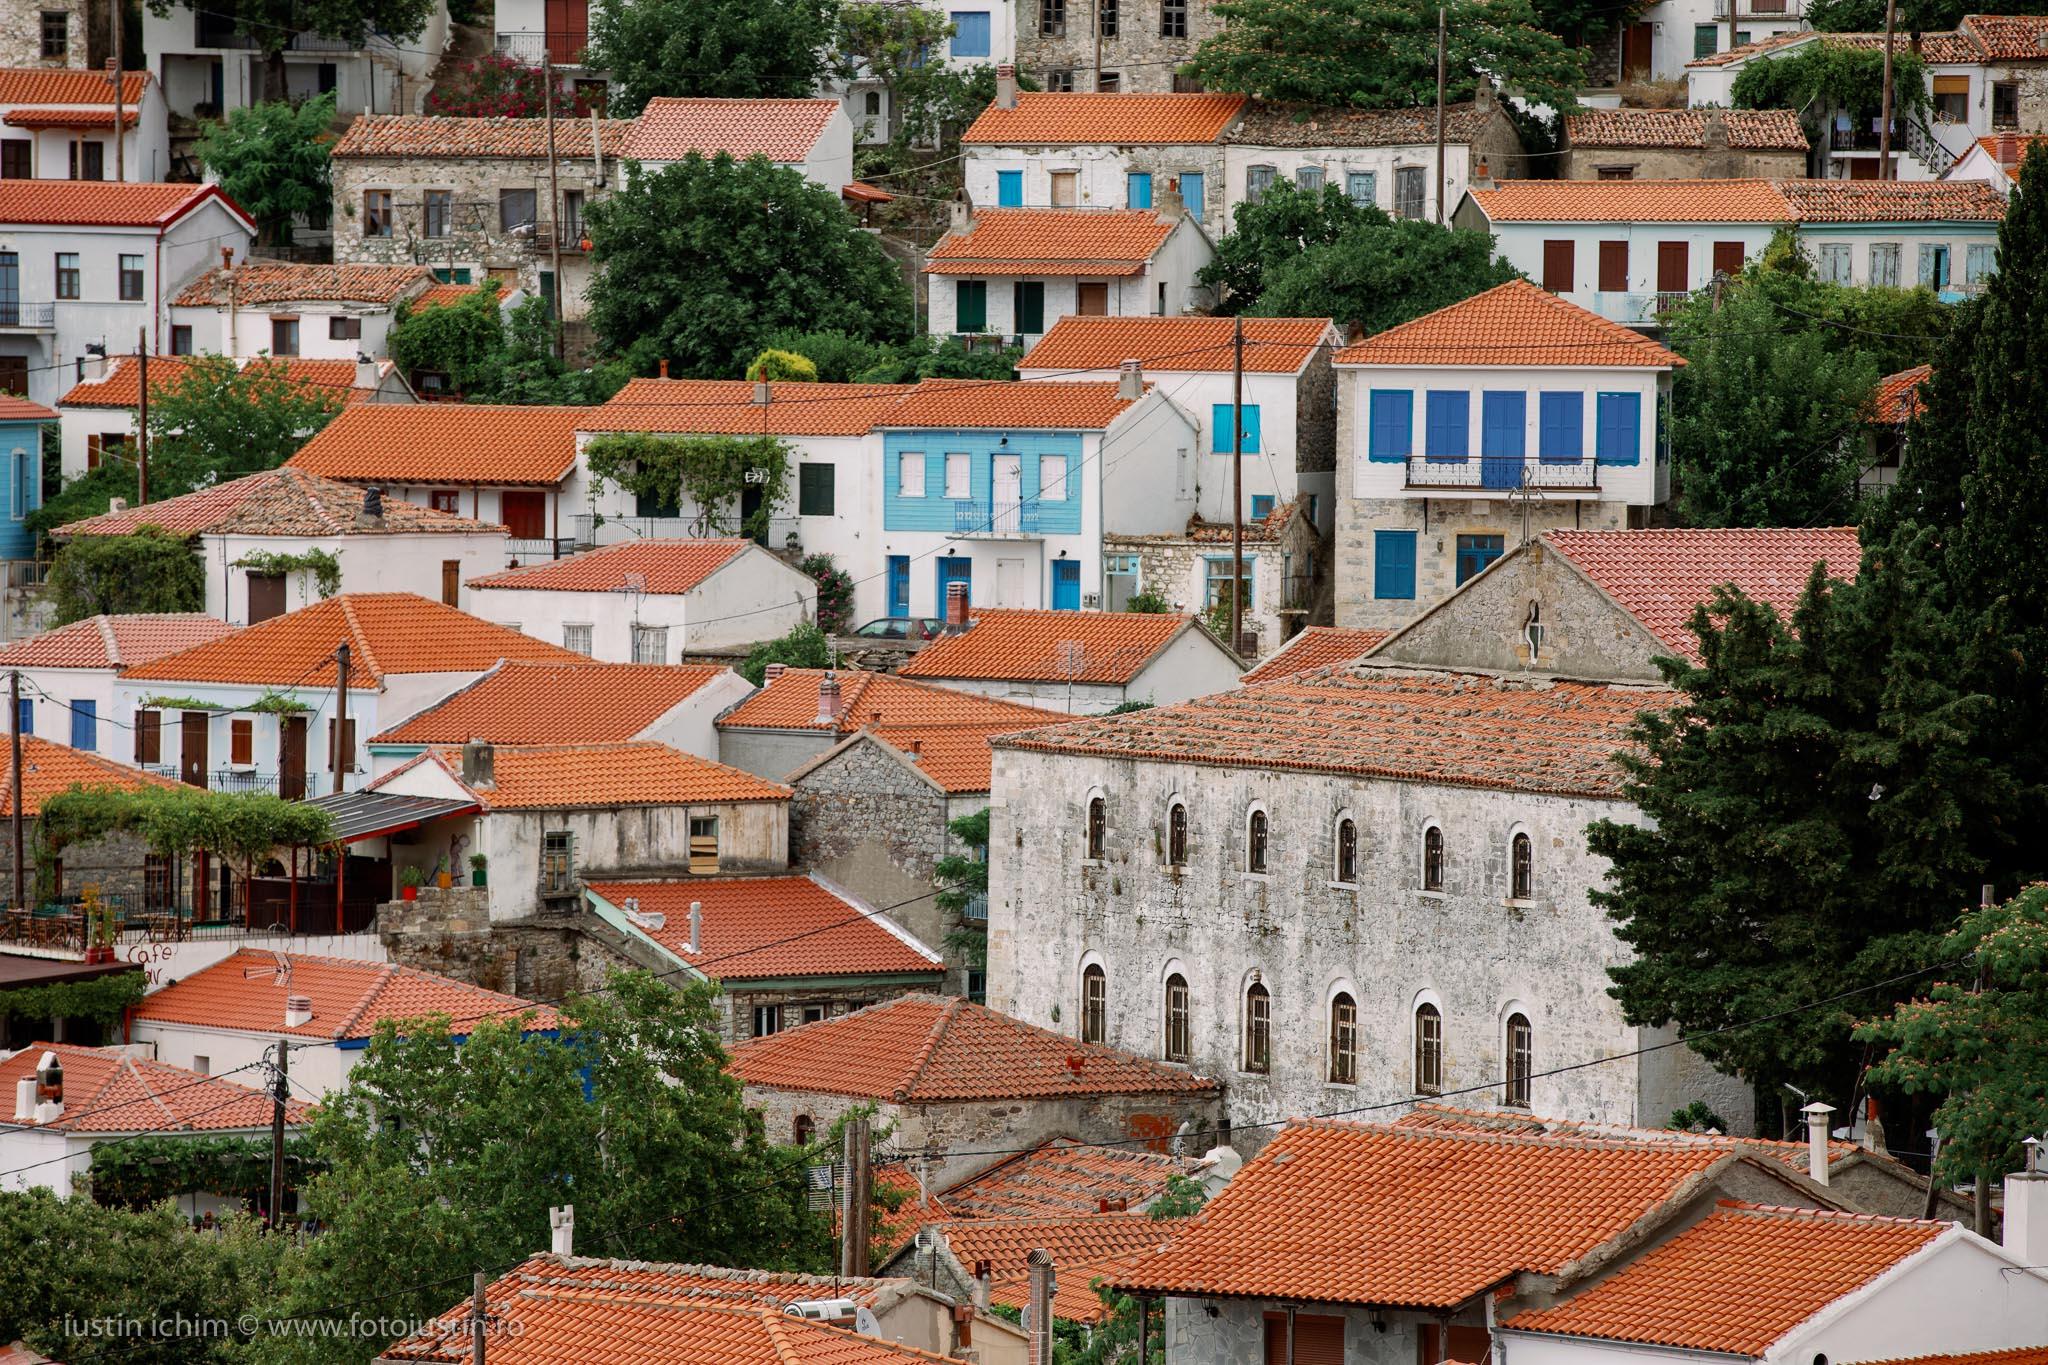 Chora, capitala insulei